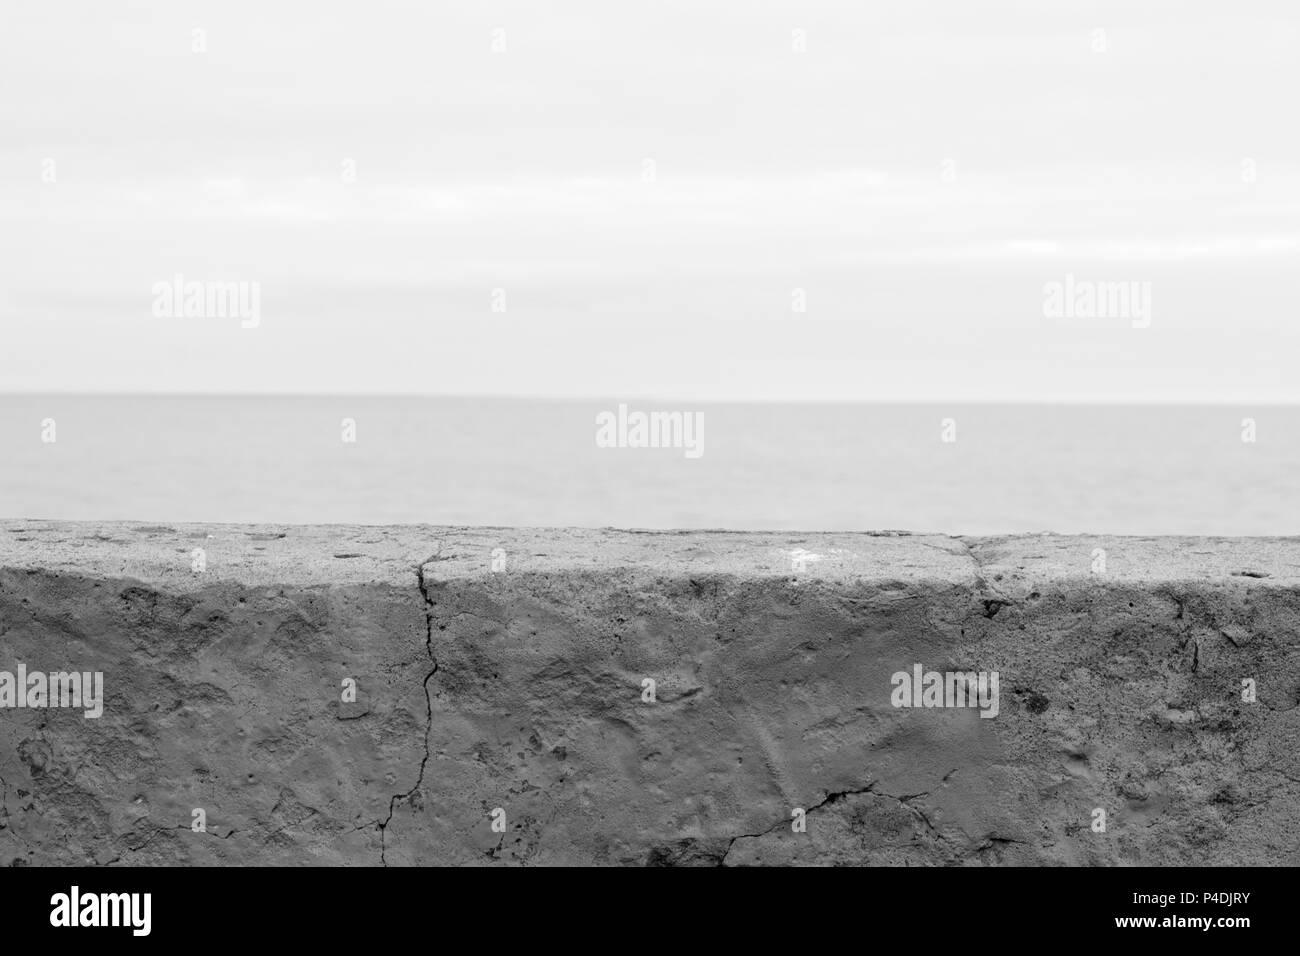 wall blocking the sea black and white photo - Stock Image